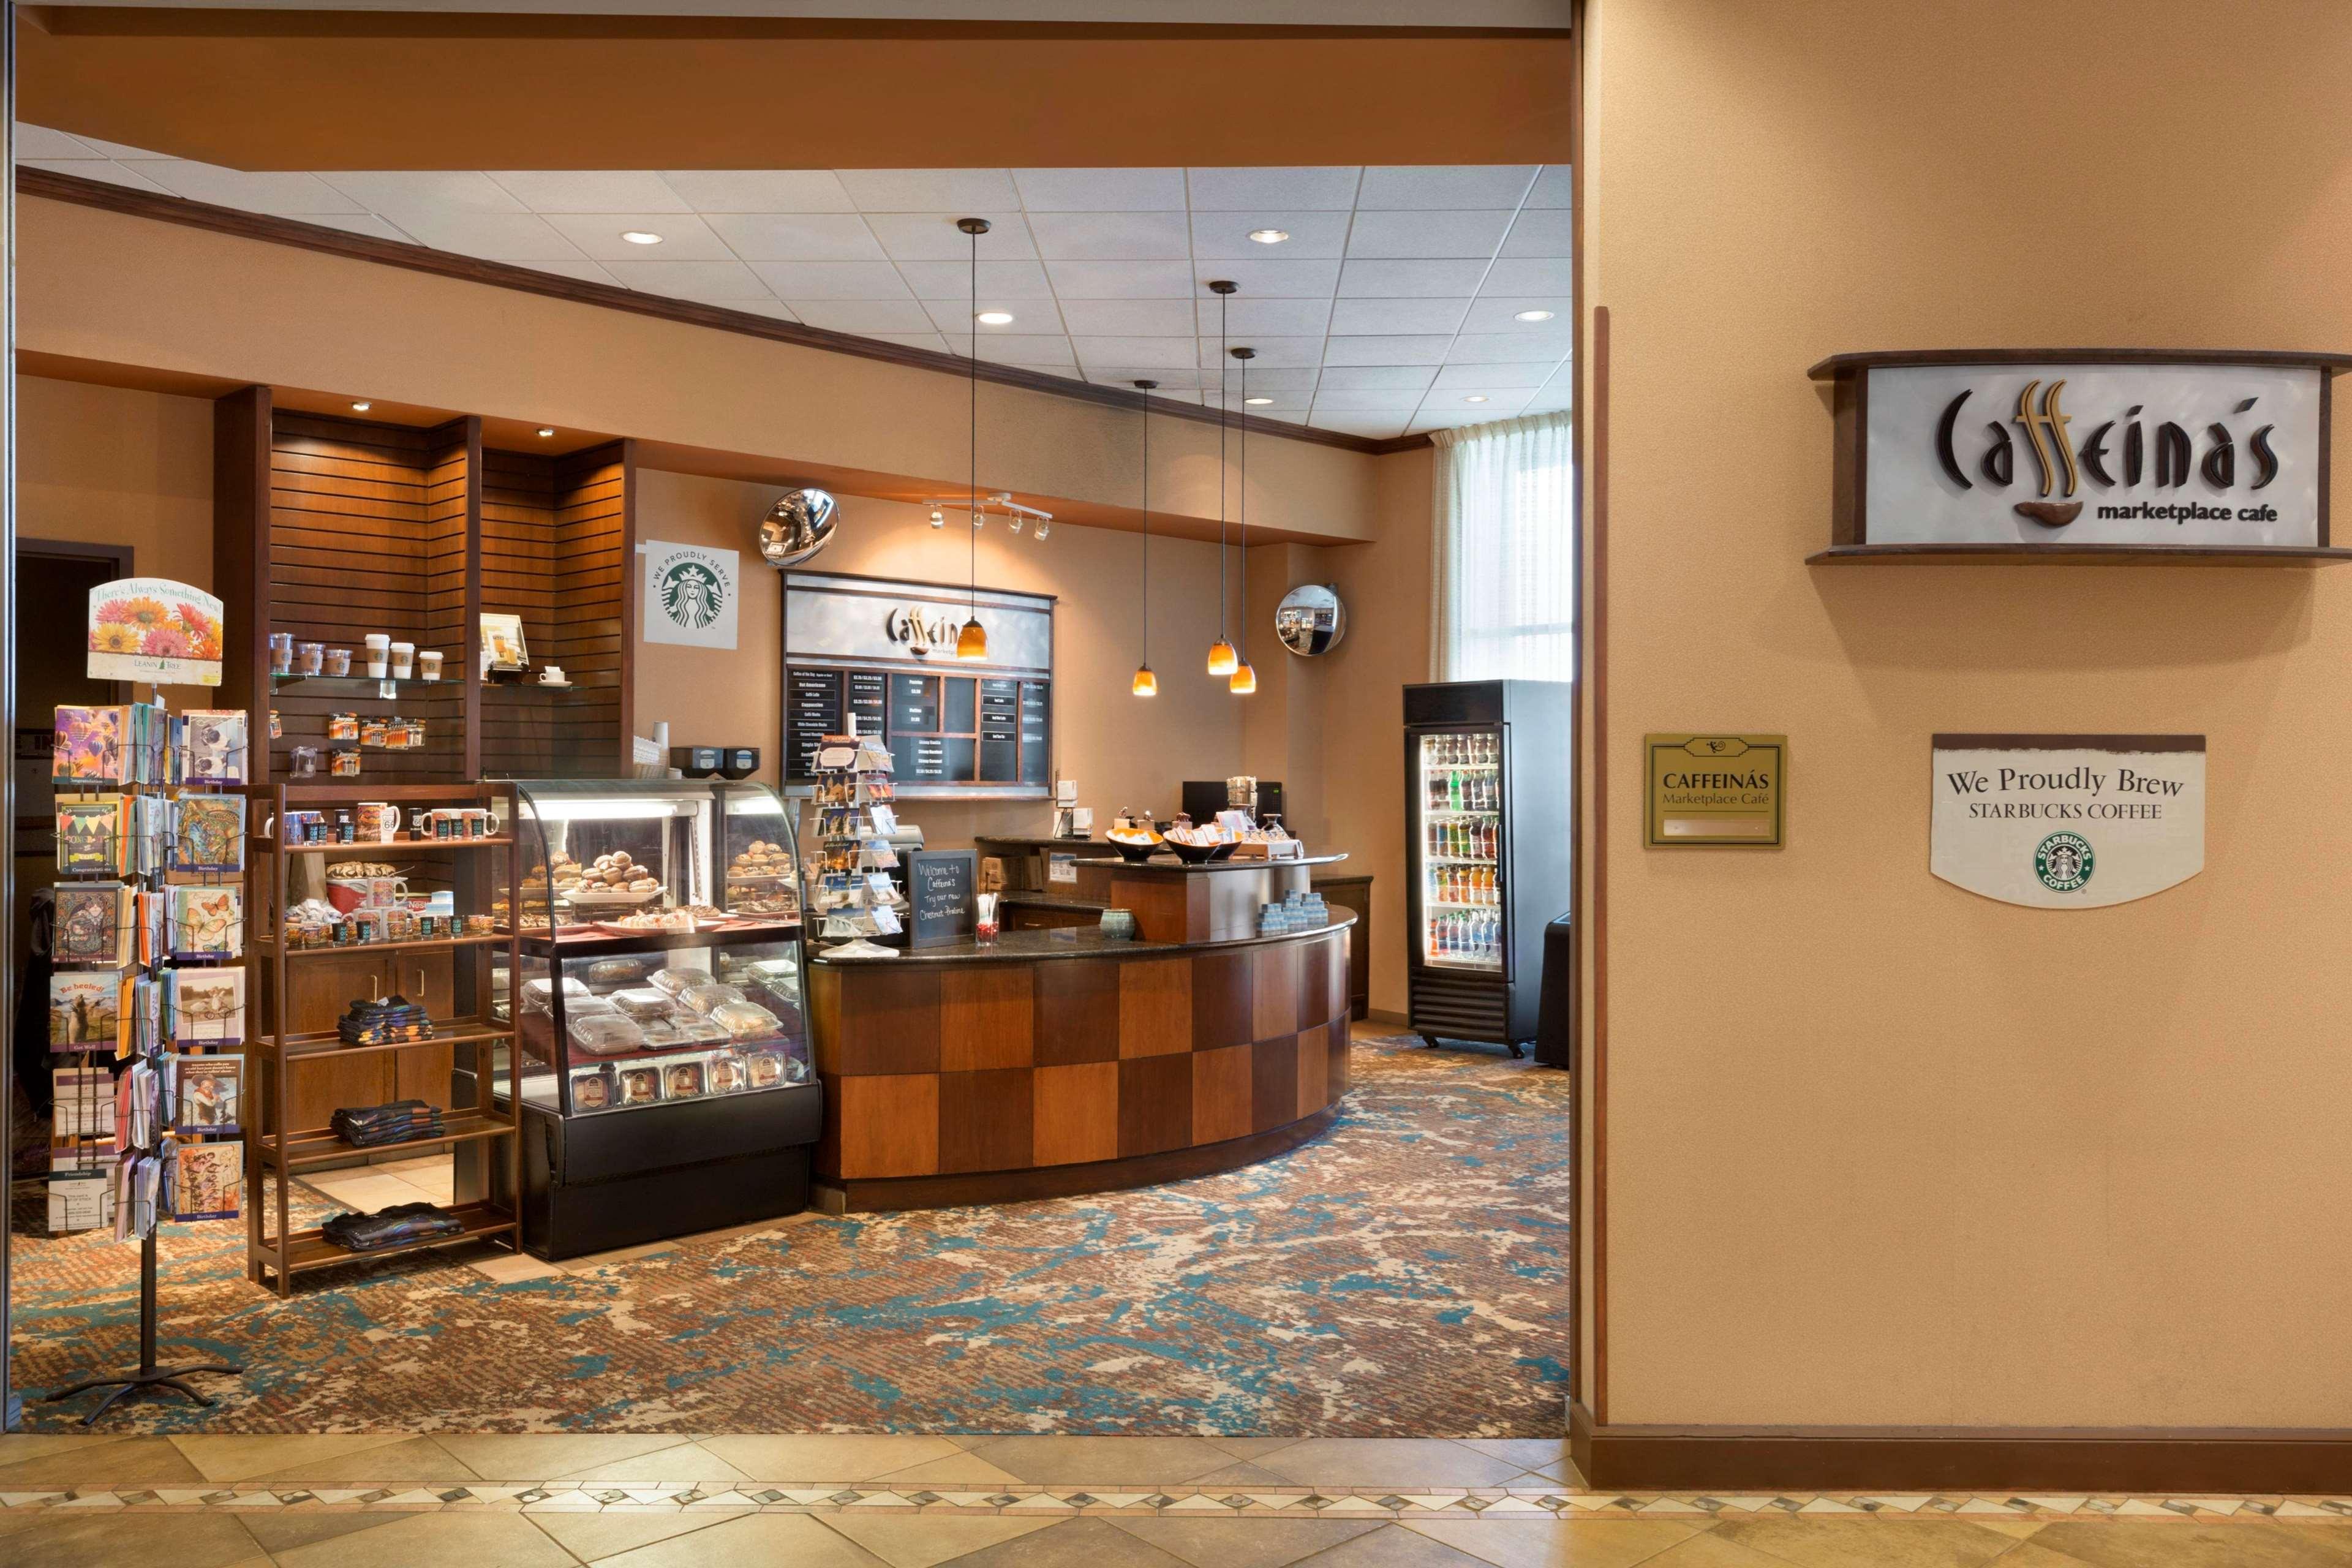 Embassy Suites by Hilton Albuquerque Hotel & Spa image 49